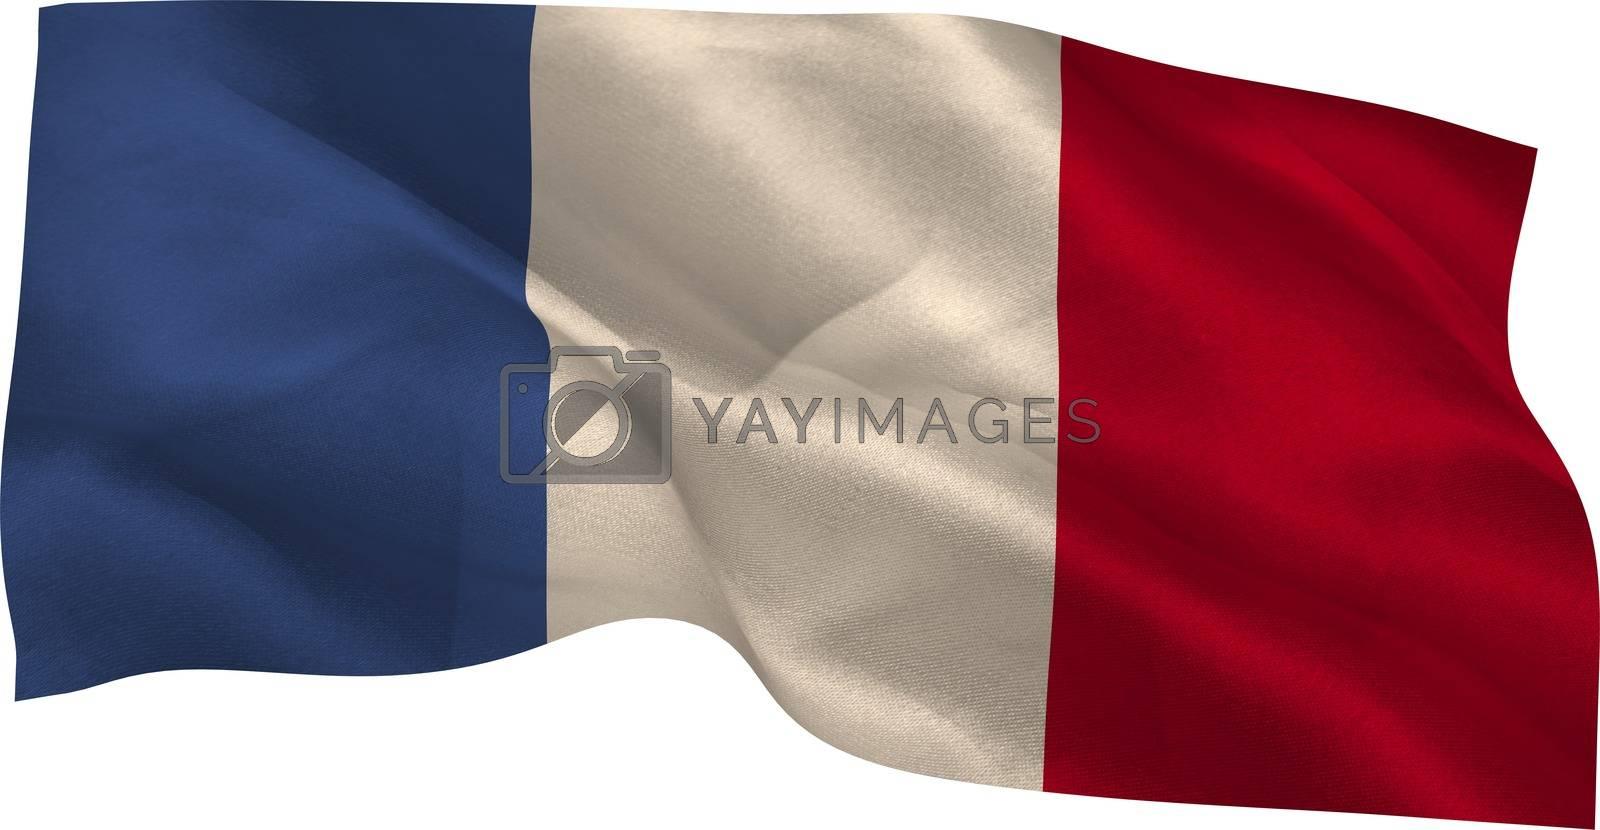 Royalty free image of Digitally generated france national flag by Wavebreakmedia